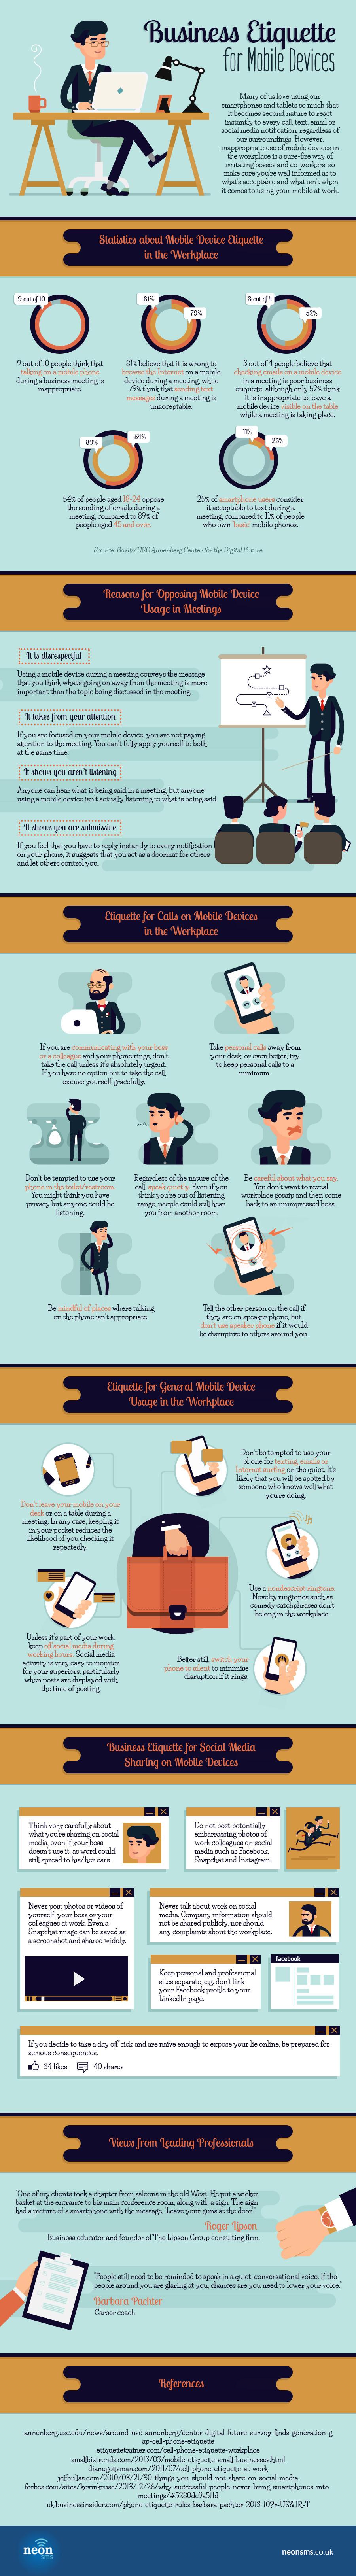 Smart phone etiquette